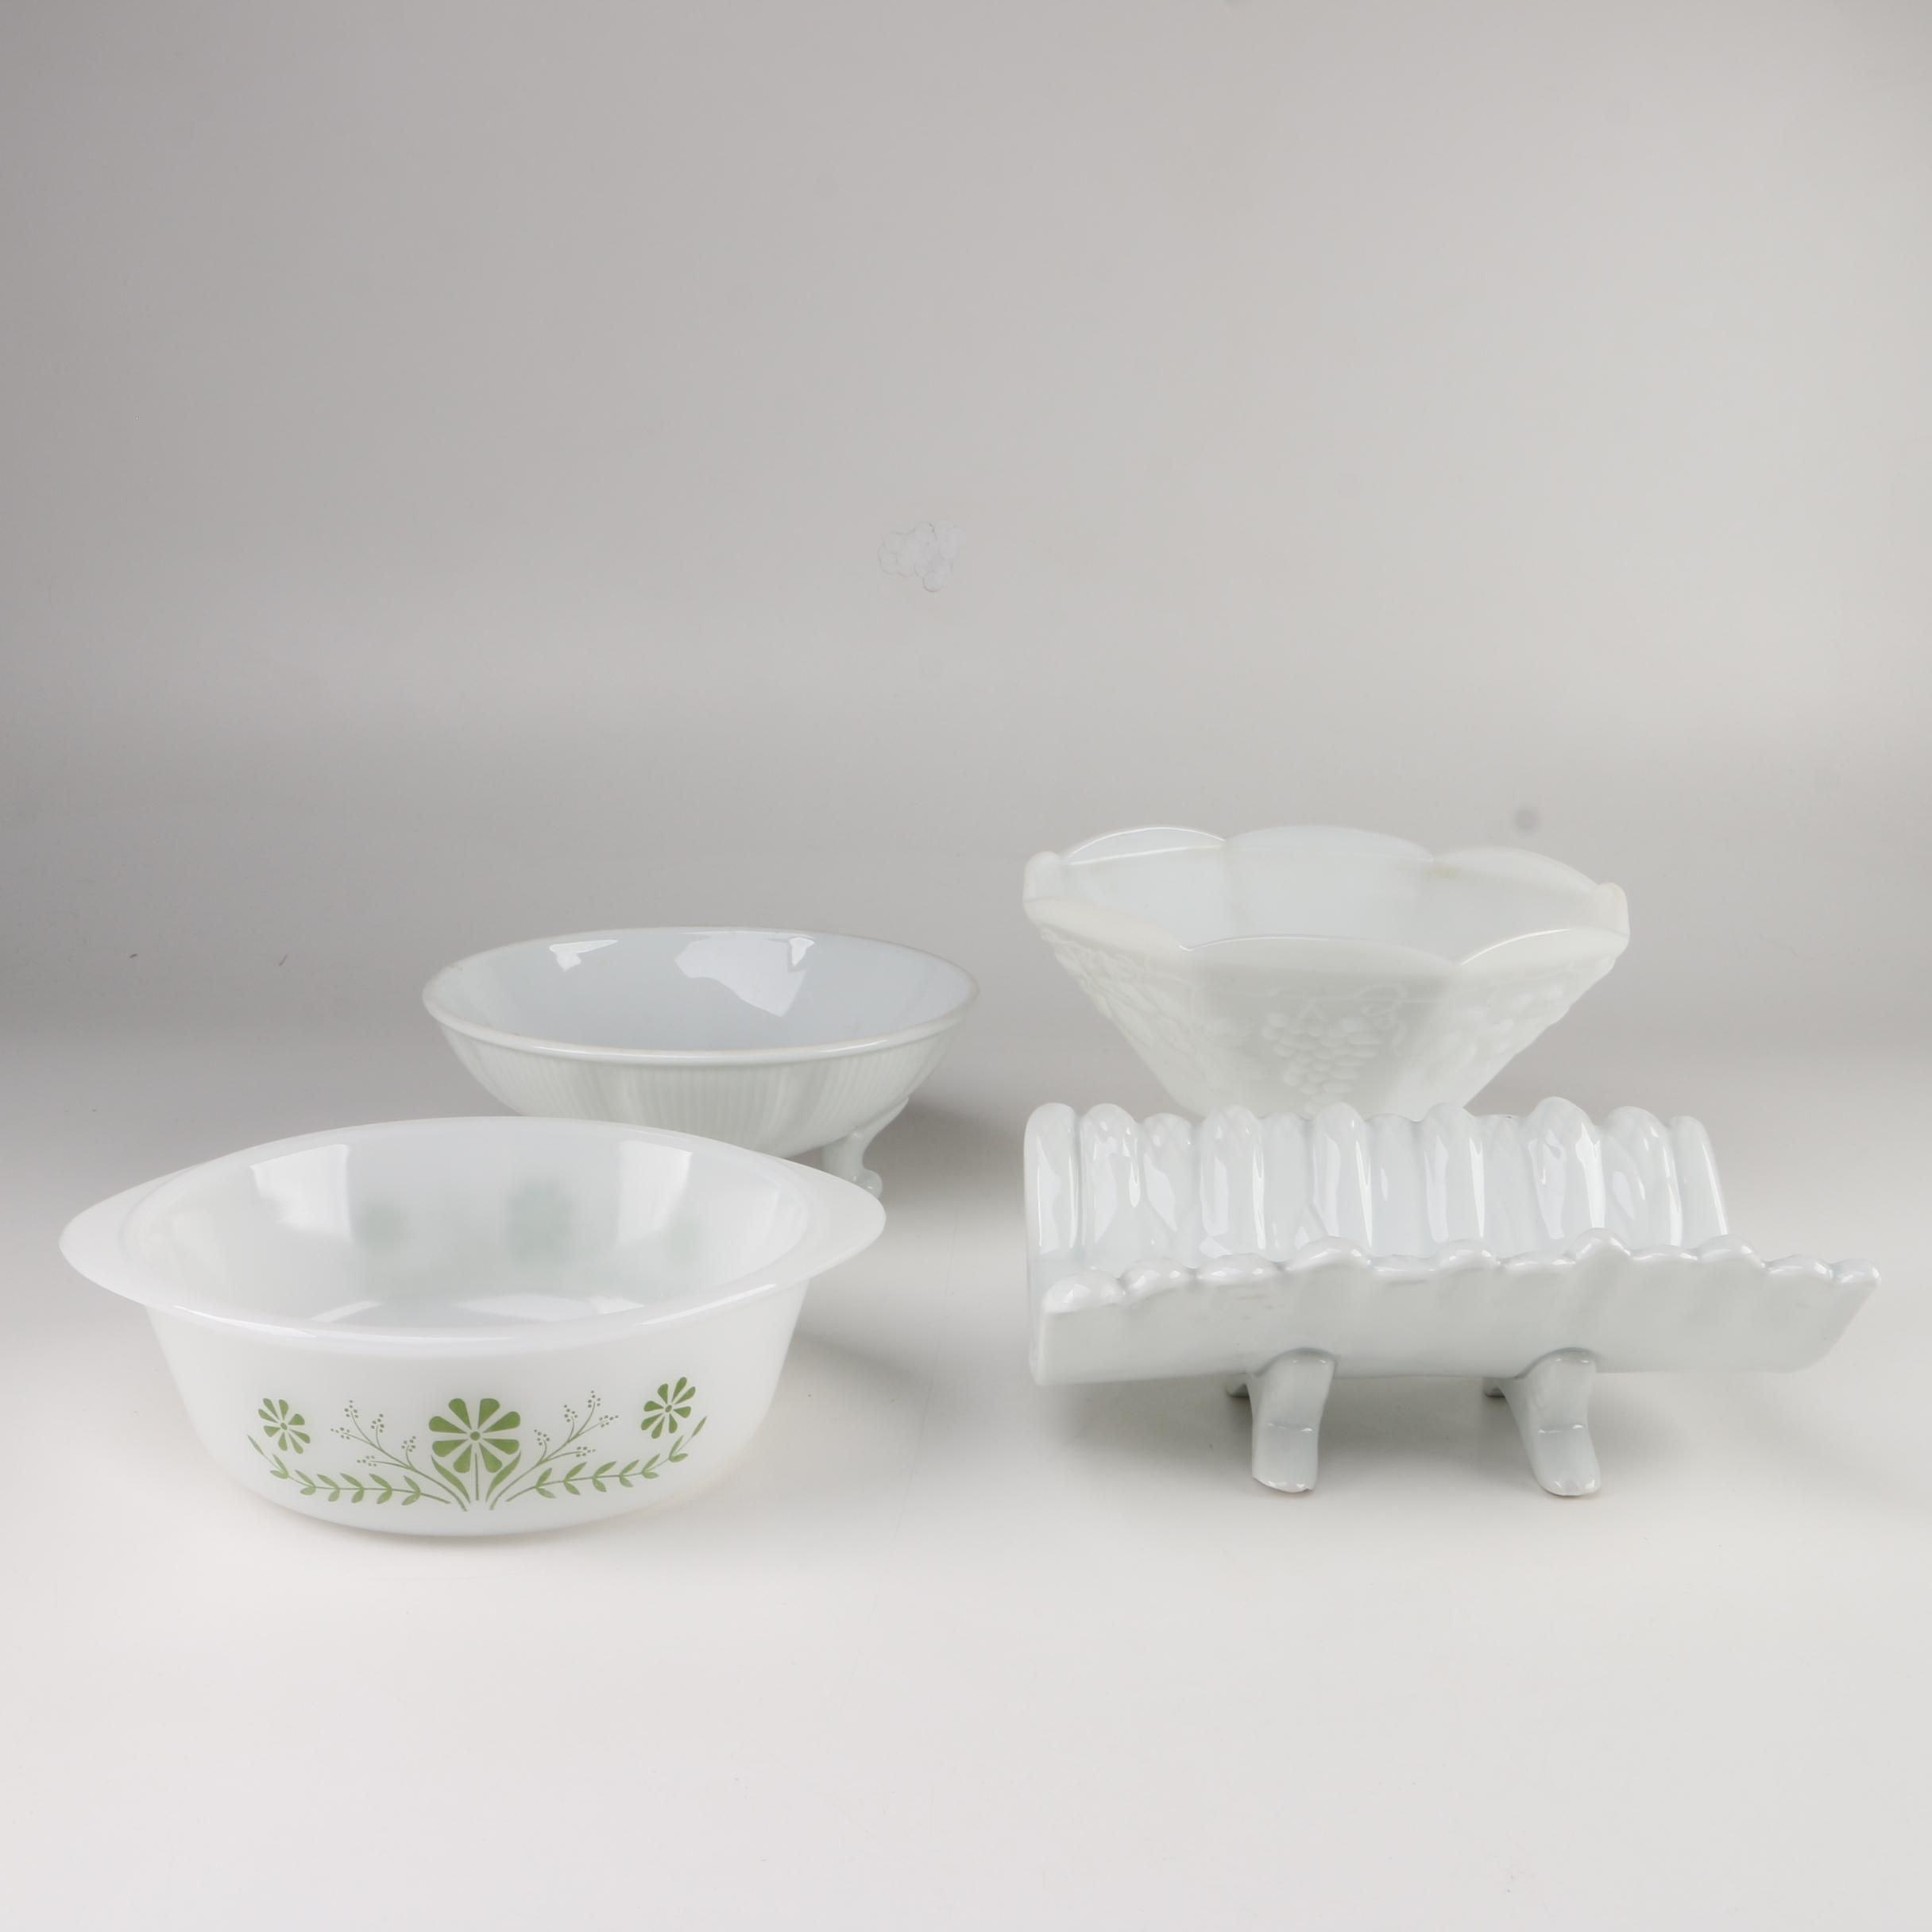 Vintage Ceramic Bowls and Decor